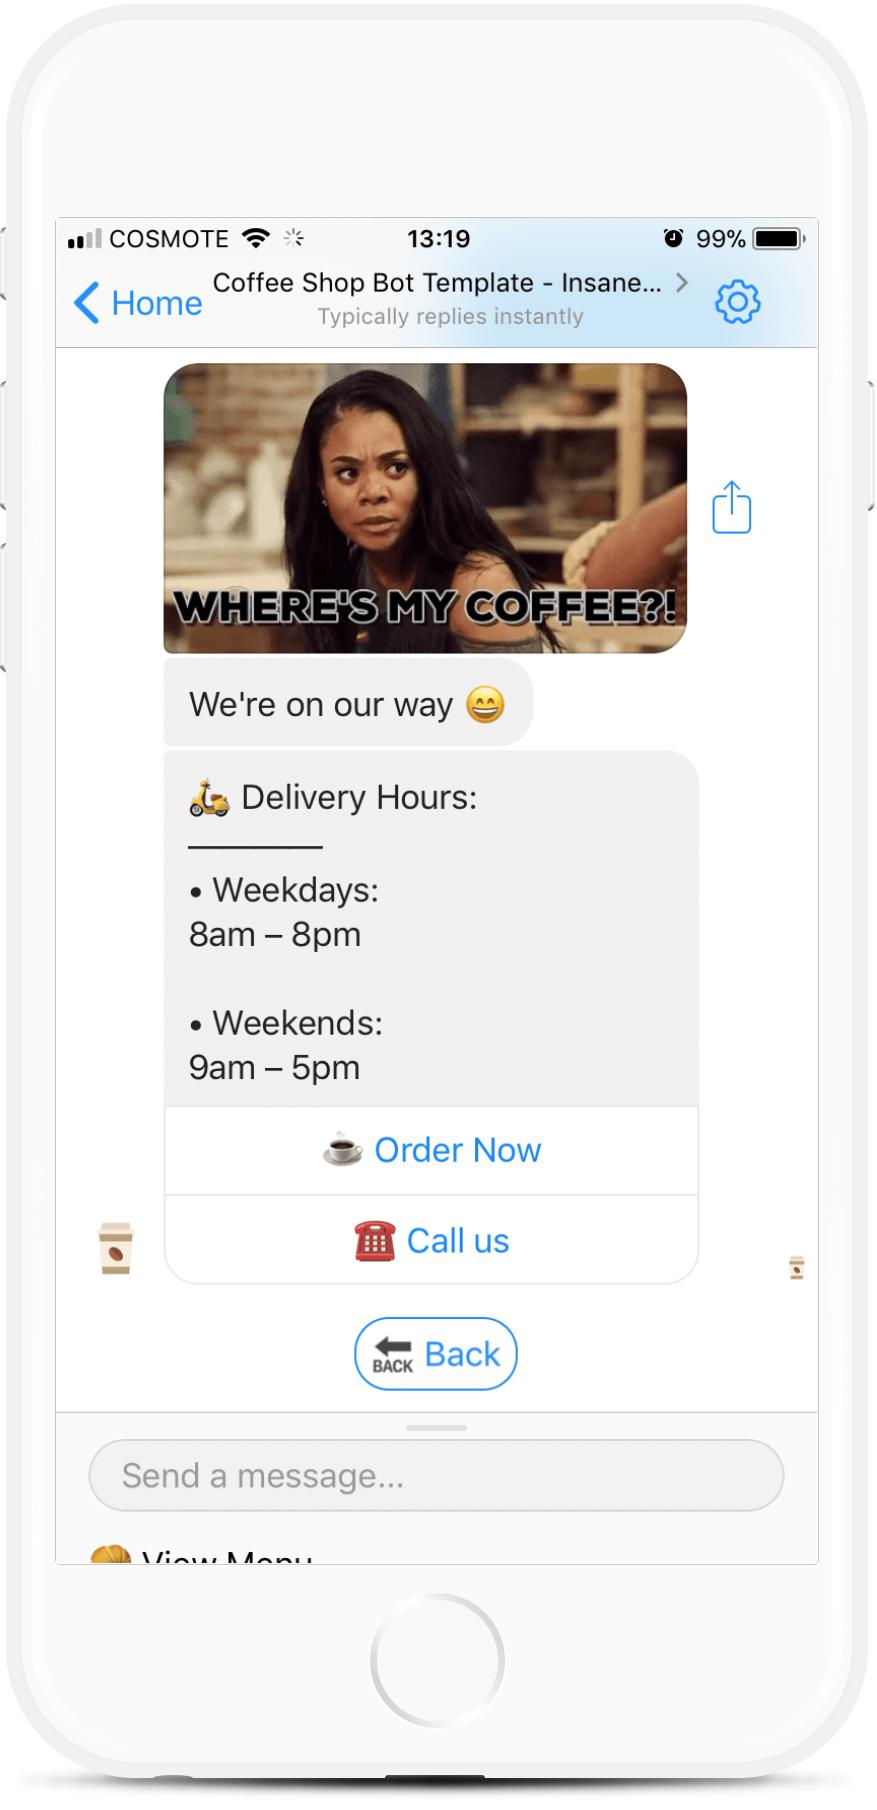 Coffee Shop Bot Template for $97   #messenger #bottemplates #bots #chatbots #aibots #fbmessenger #botmakers